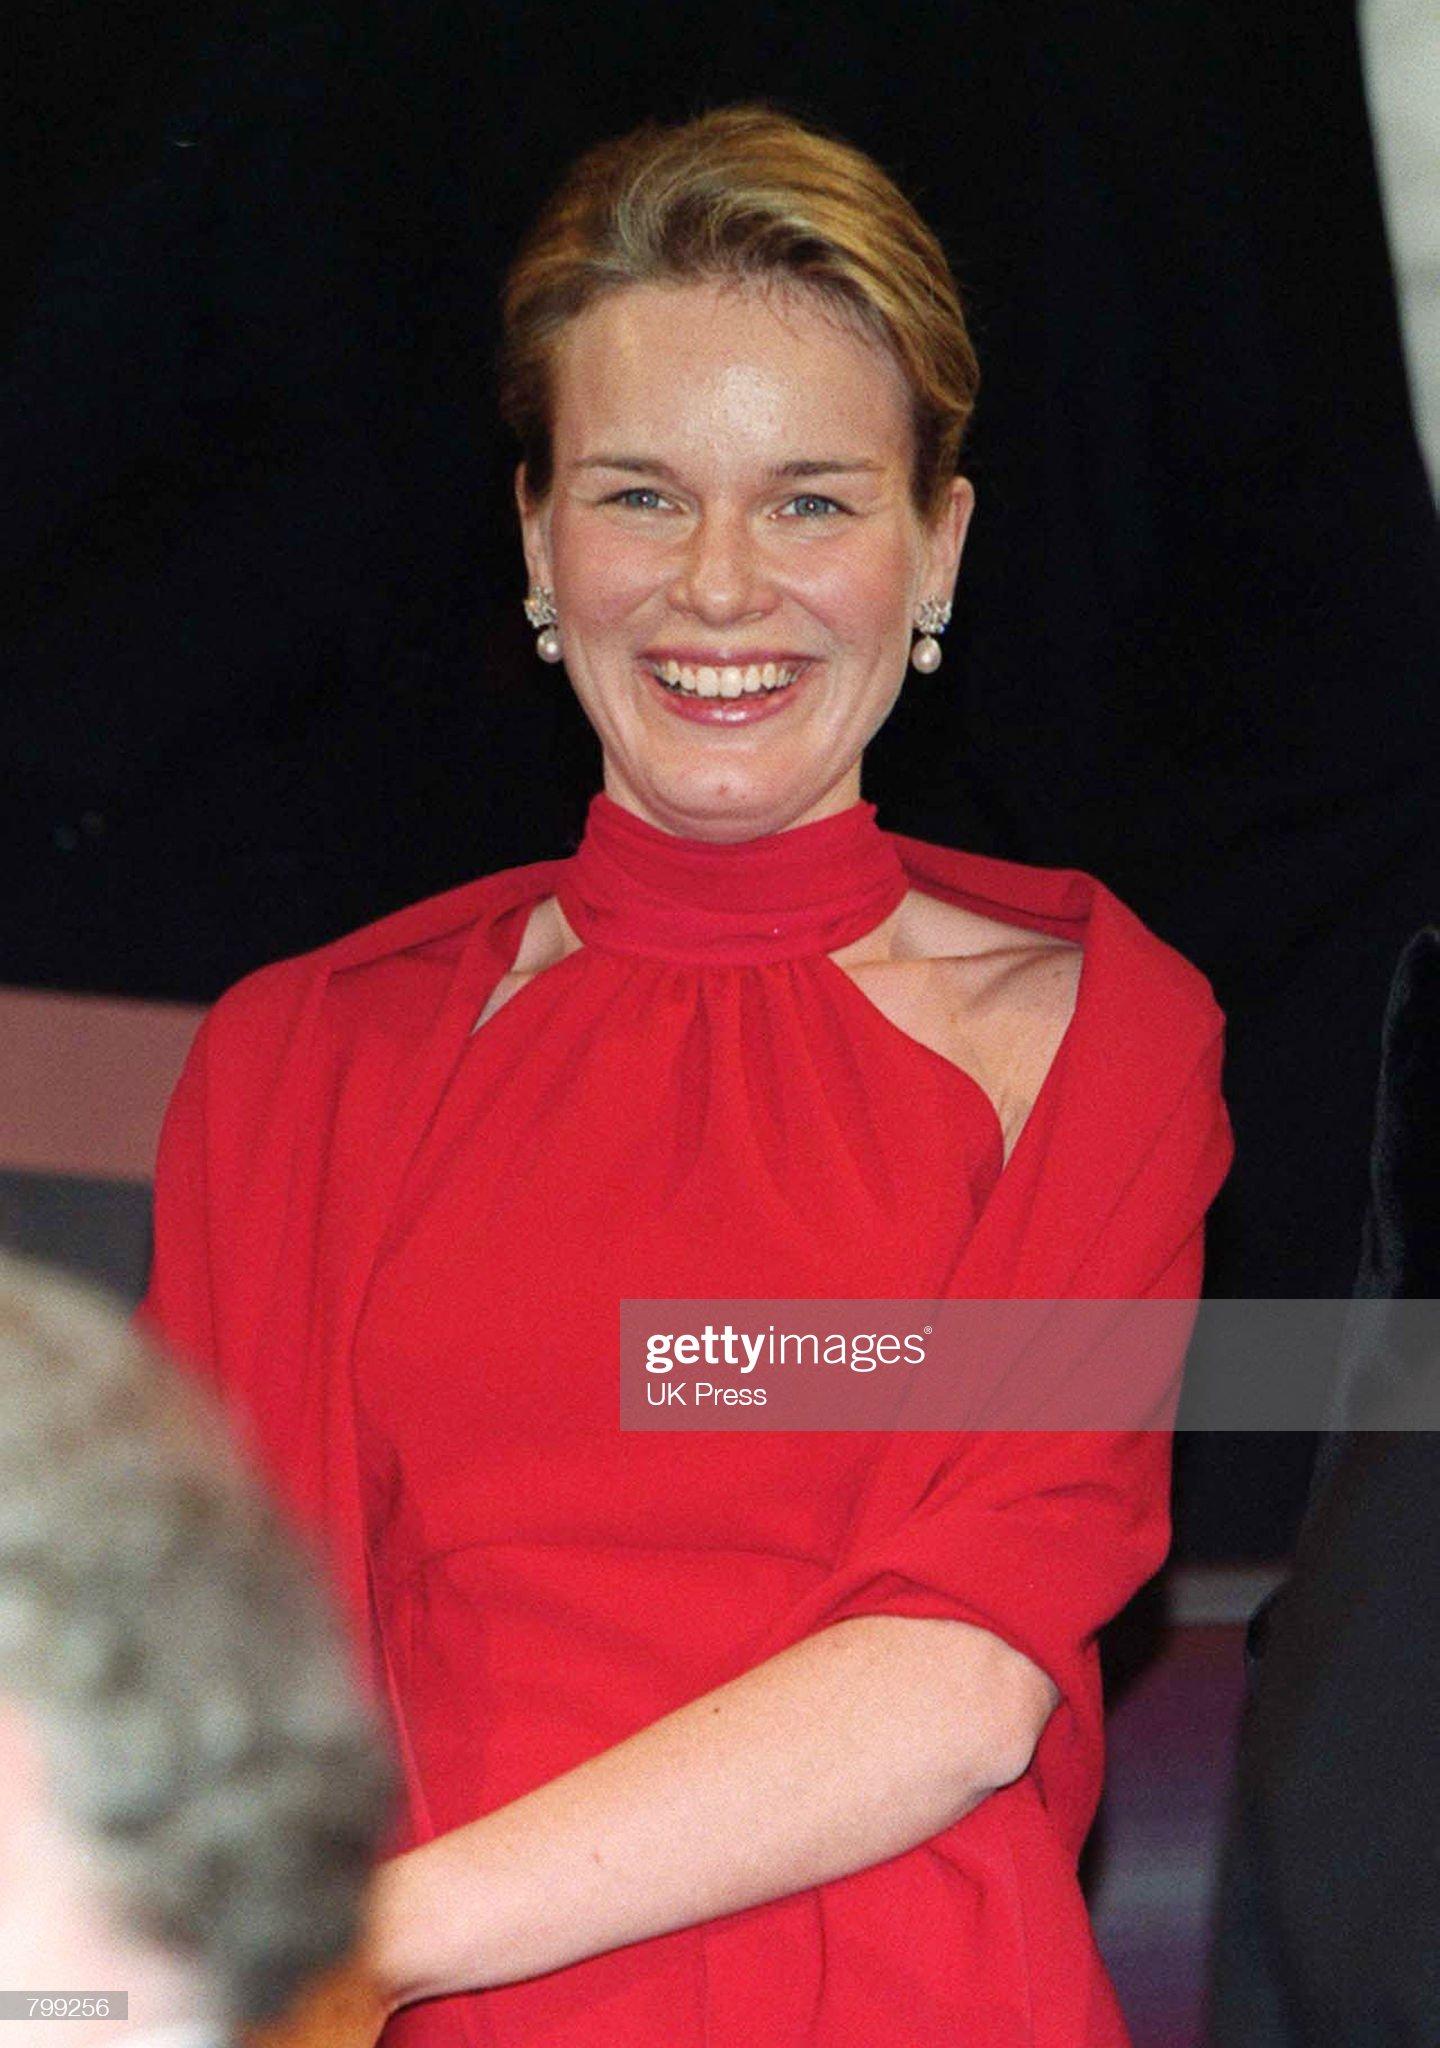 Вечерние наряды Королевы Матильды Grand Duke's Accession Celebration : News Photo